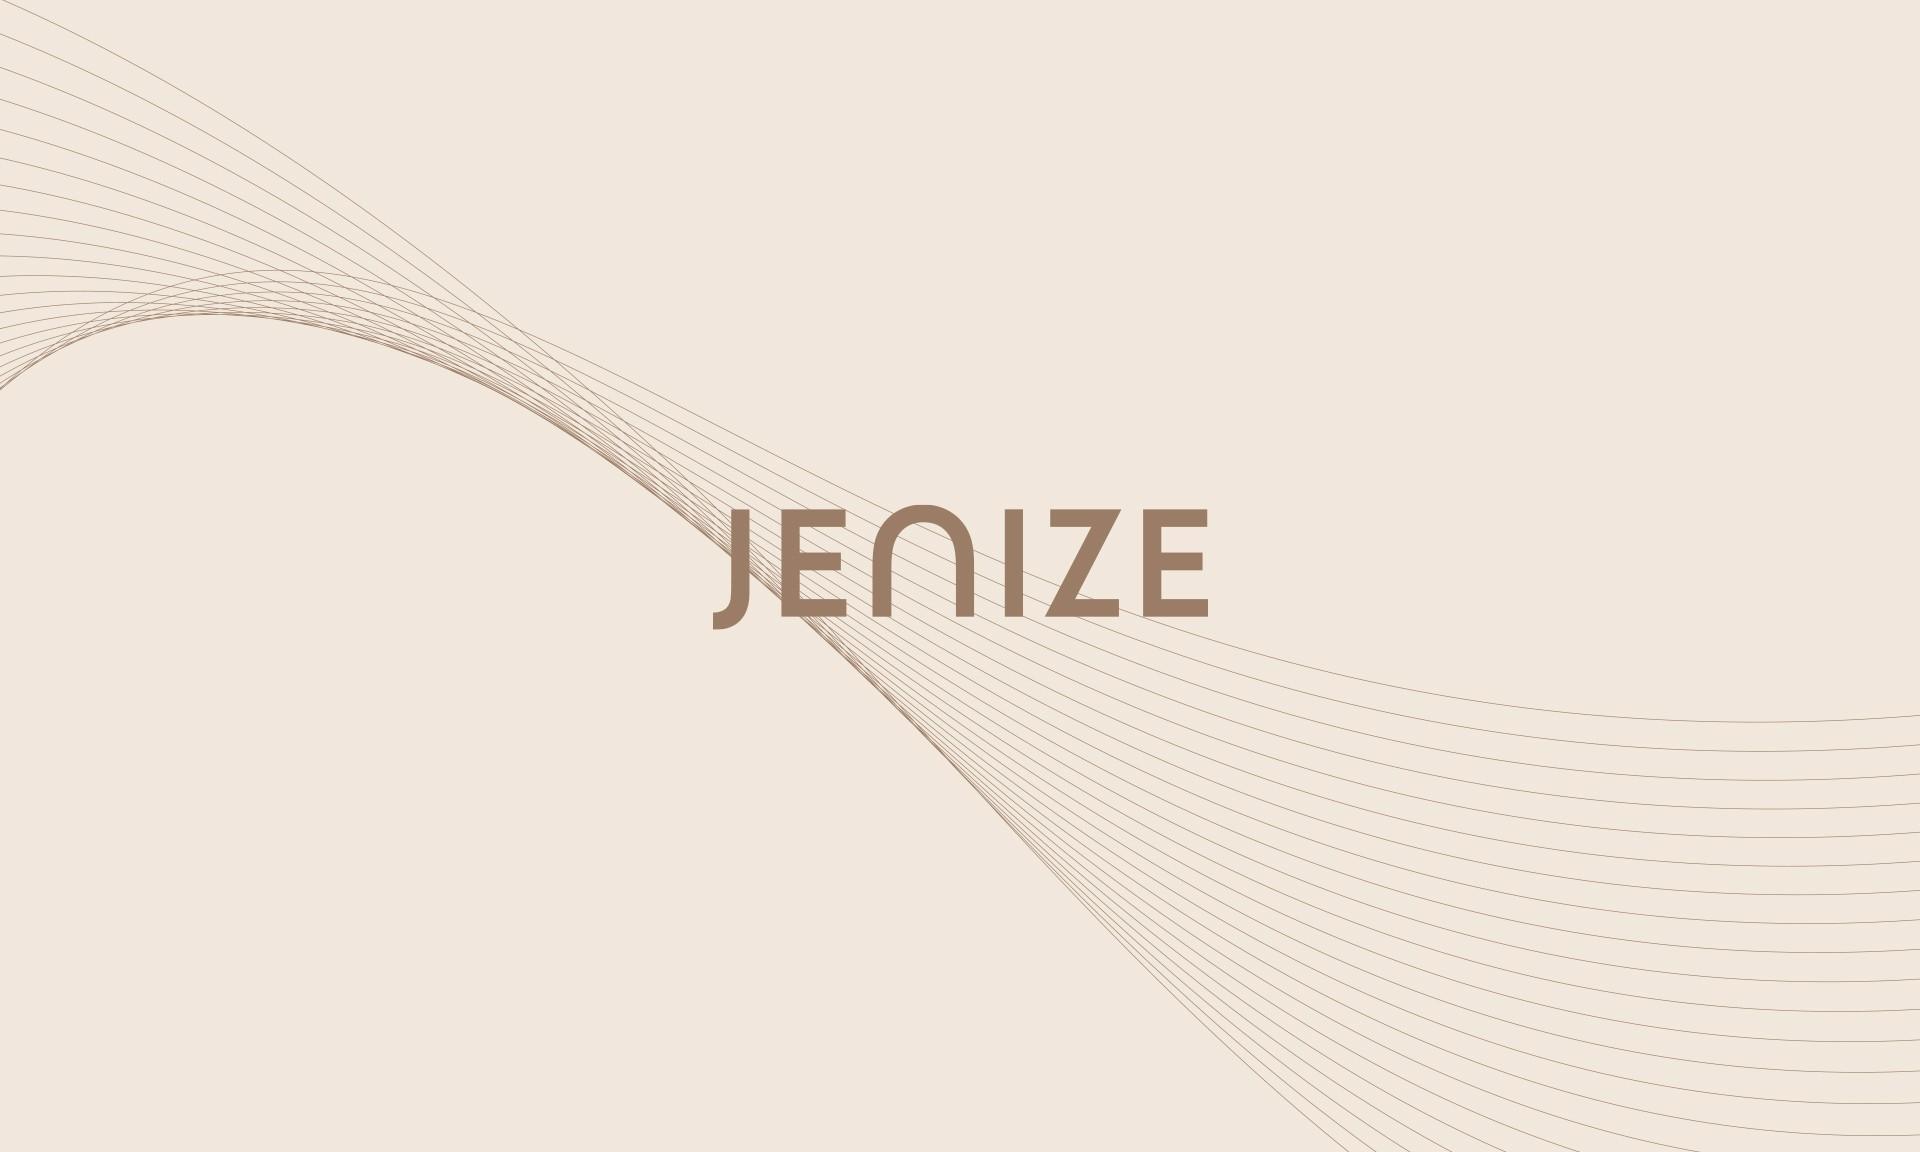 Jenize-01